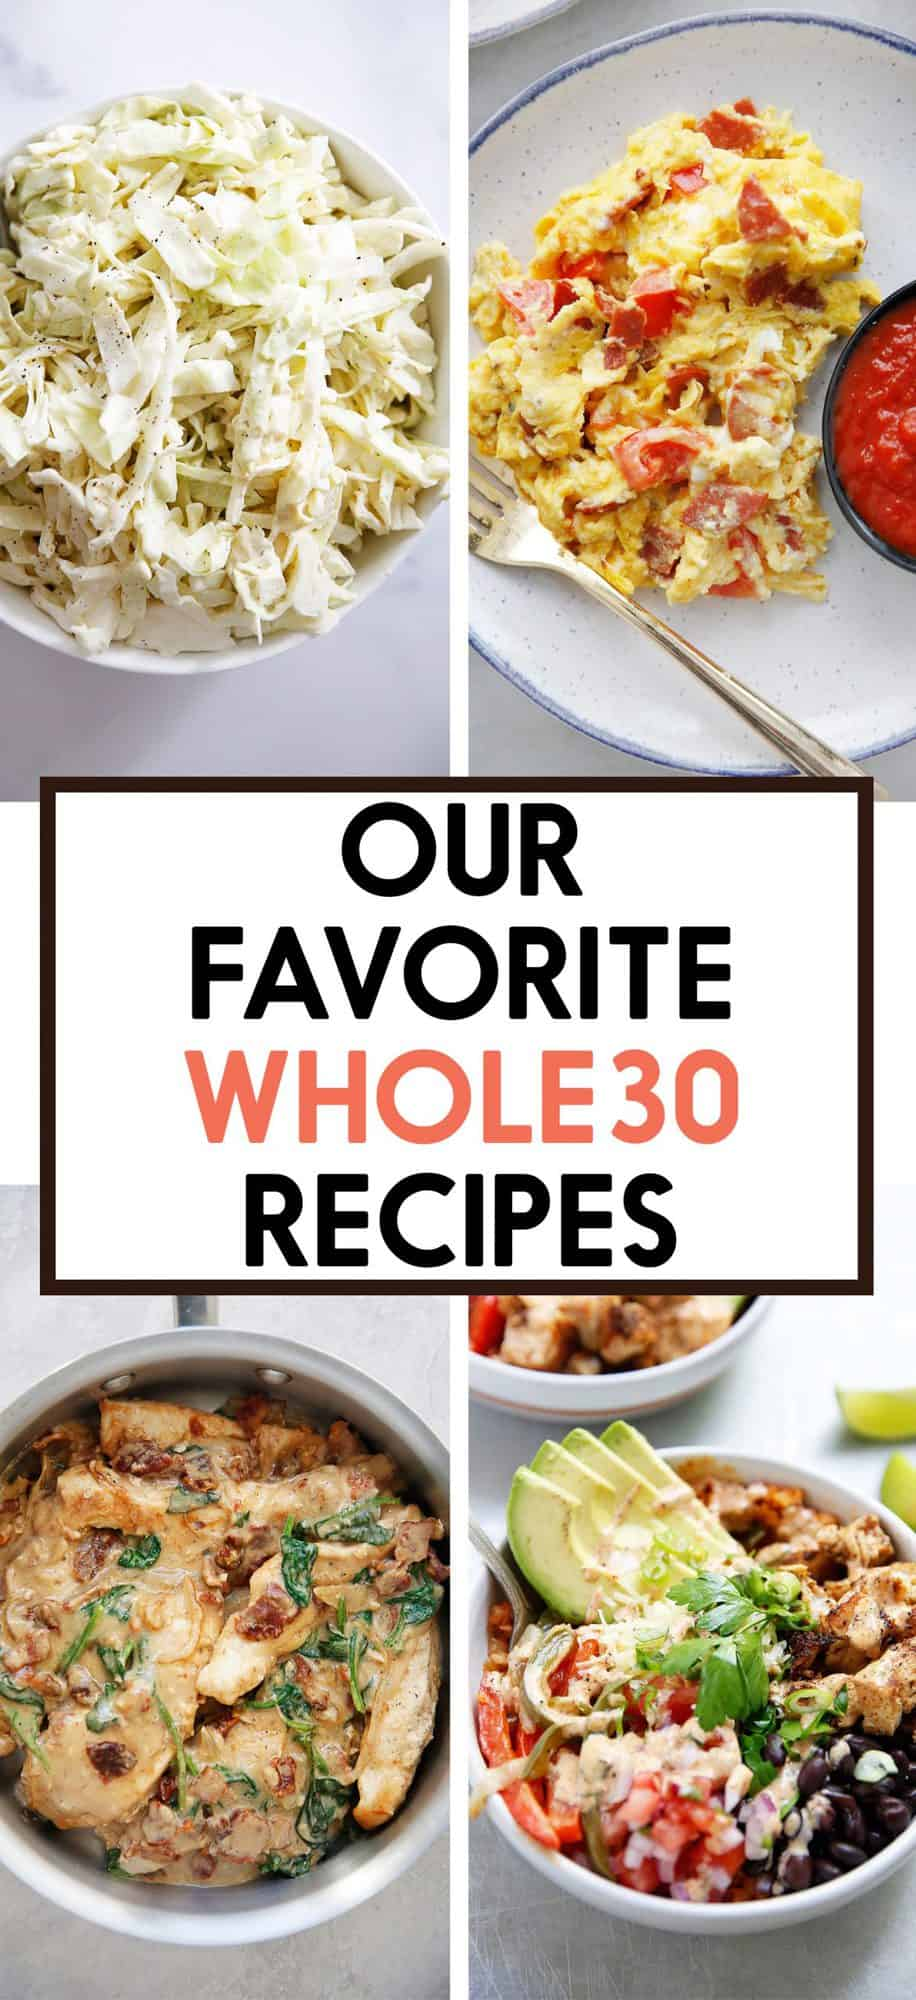 Lexi S Clean Kitchen Our Favorite Whole30 Recipes